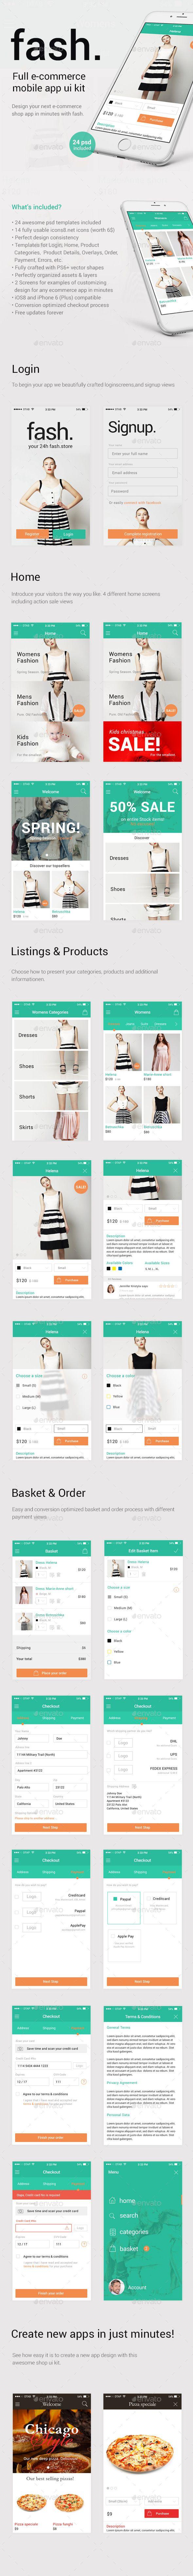 Fash – A Mobile E-Commerce Shop UI Design Kit (User Interfaces)